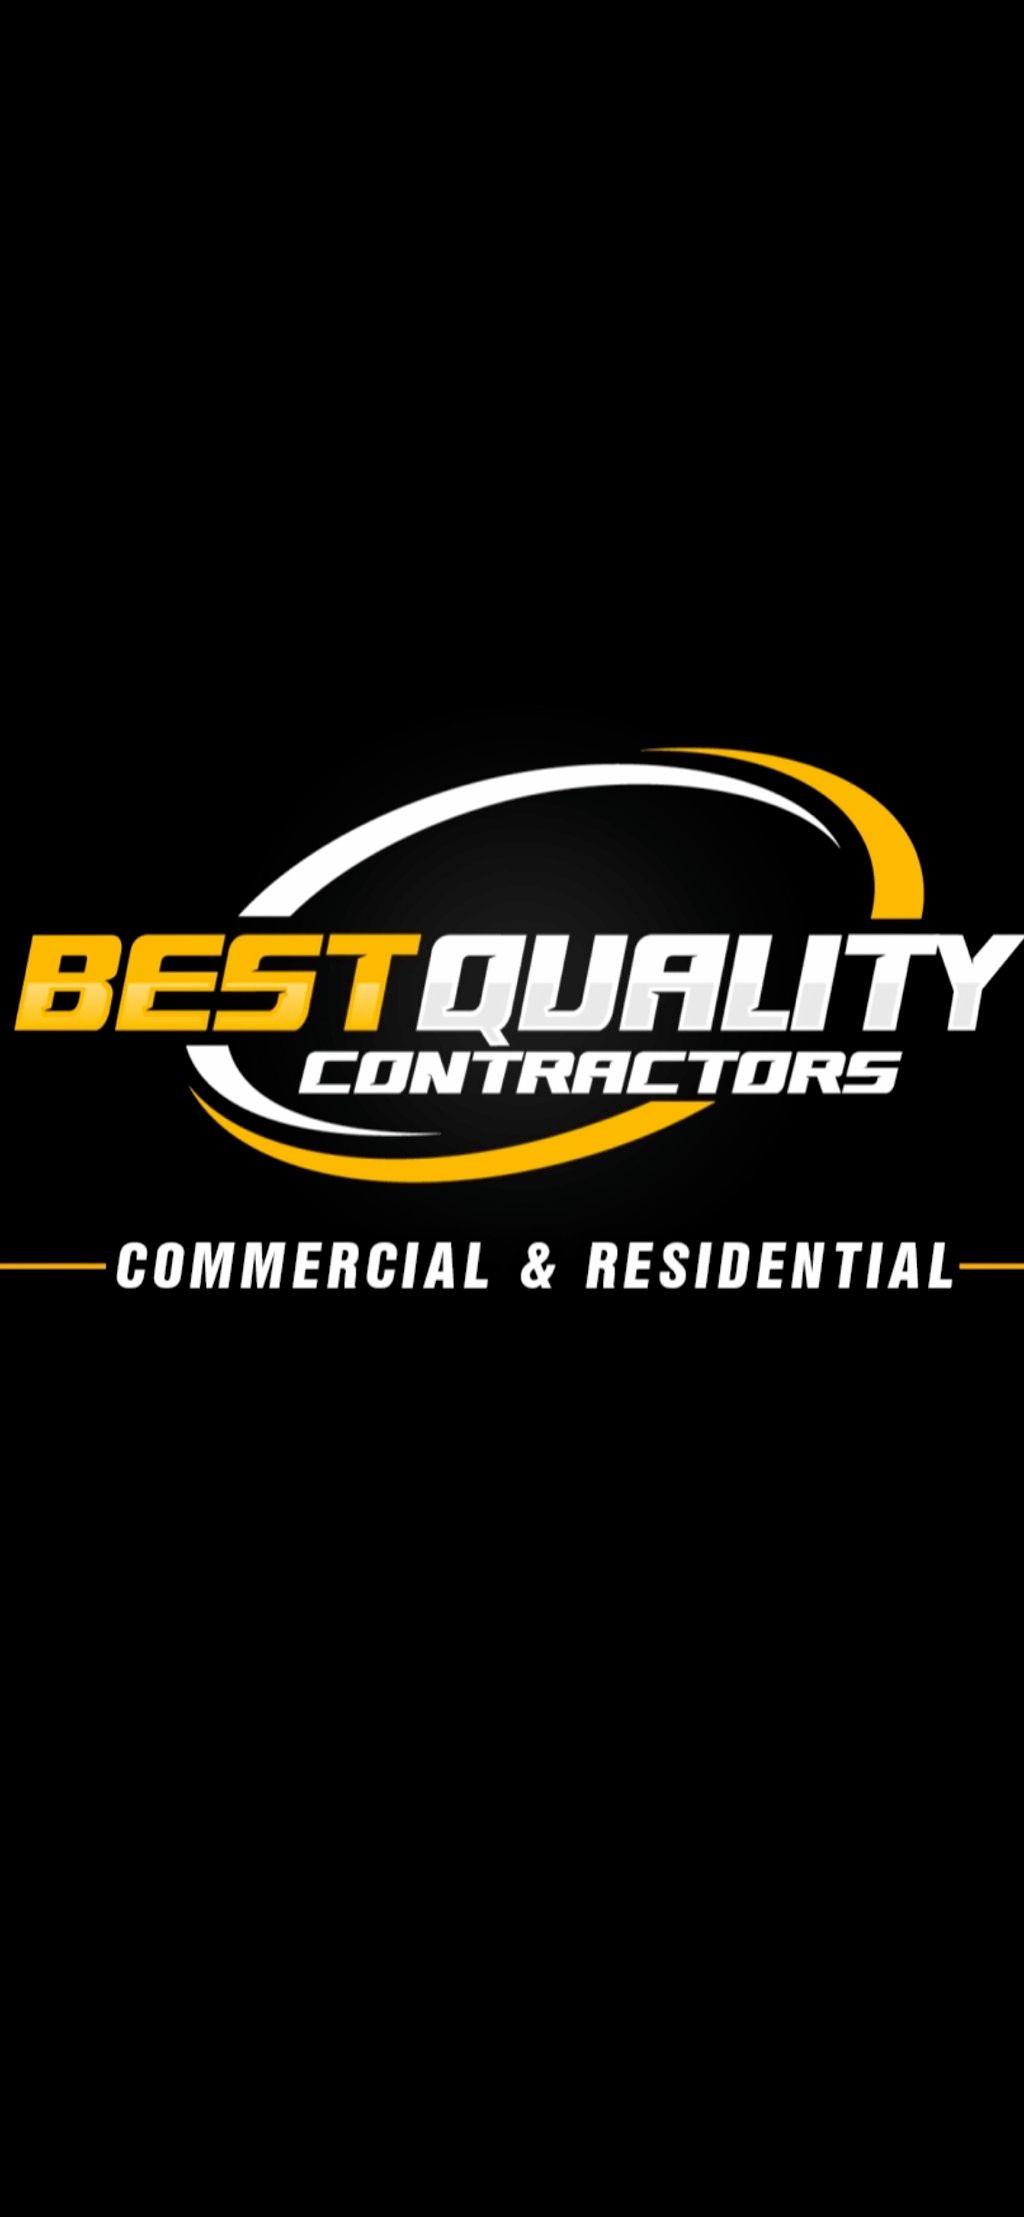 Best Quality Contractors